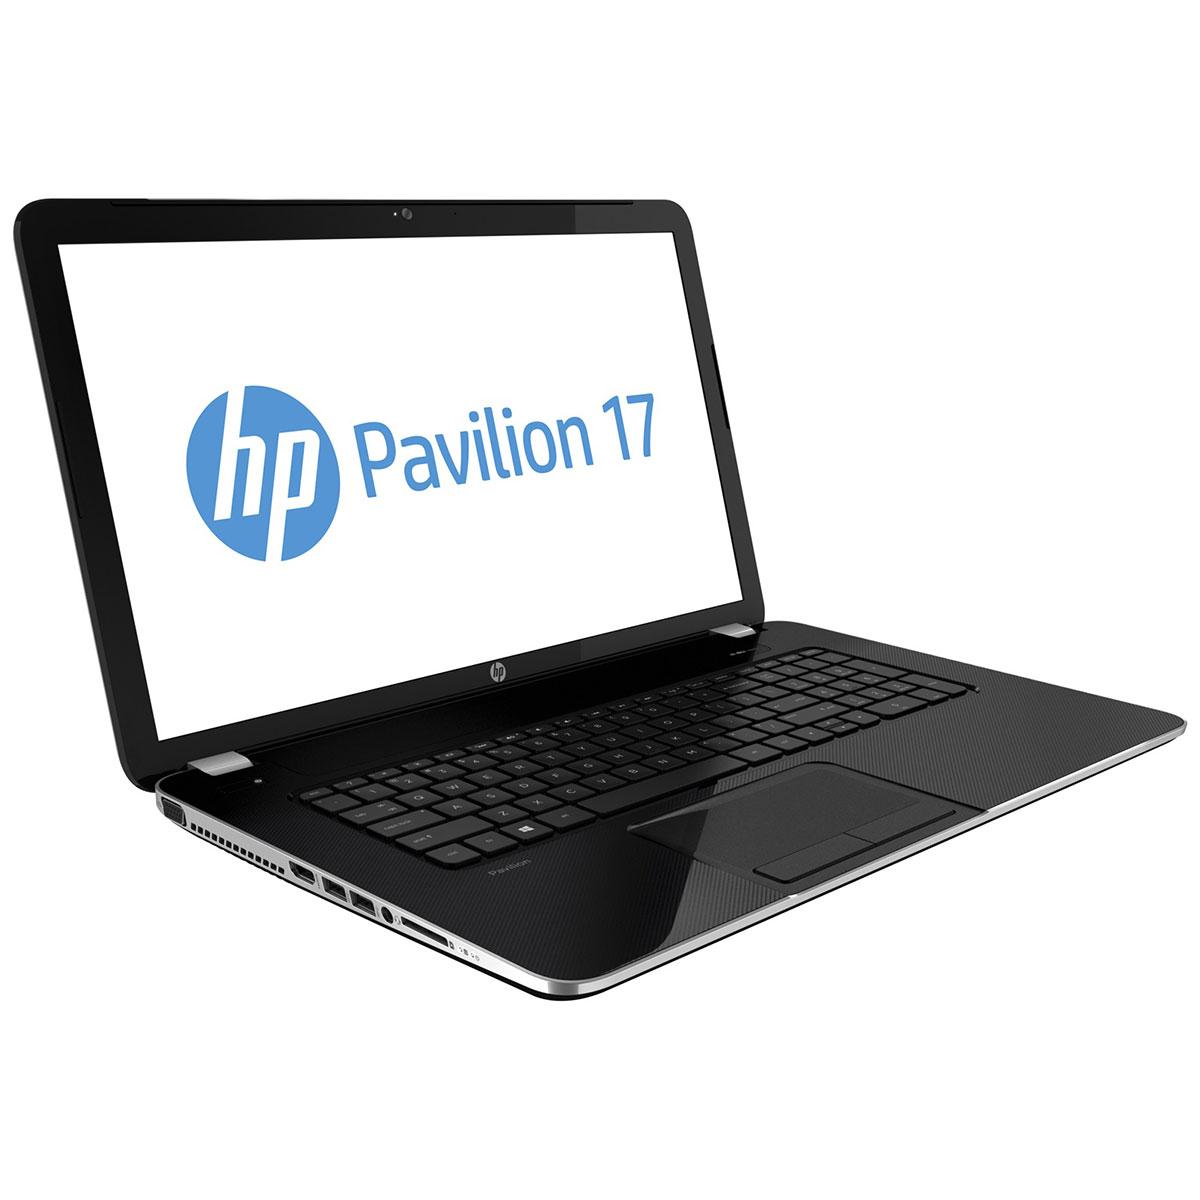 "PC portable HP Pavilion 17-e063sf (E8P61EA) AMD Dual-Core E1-2500 4 Go 500 Go 17.3"" LED Graveur DVD Wi-Fi N Webcam Windows 8 64 bits"